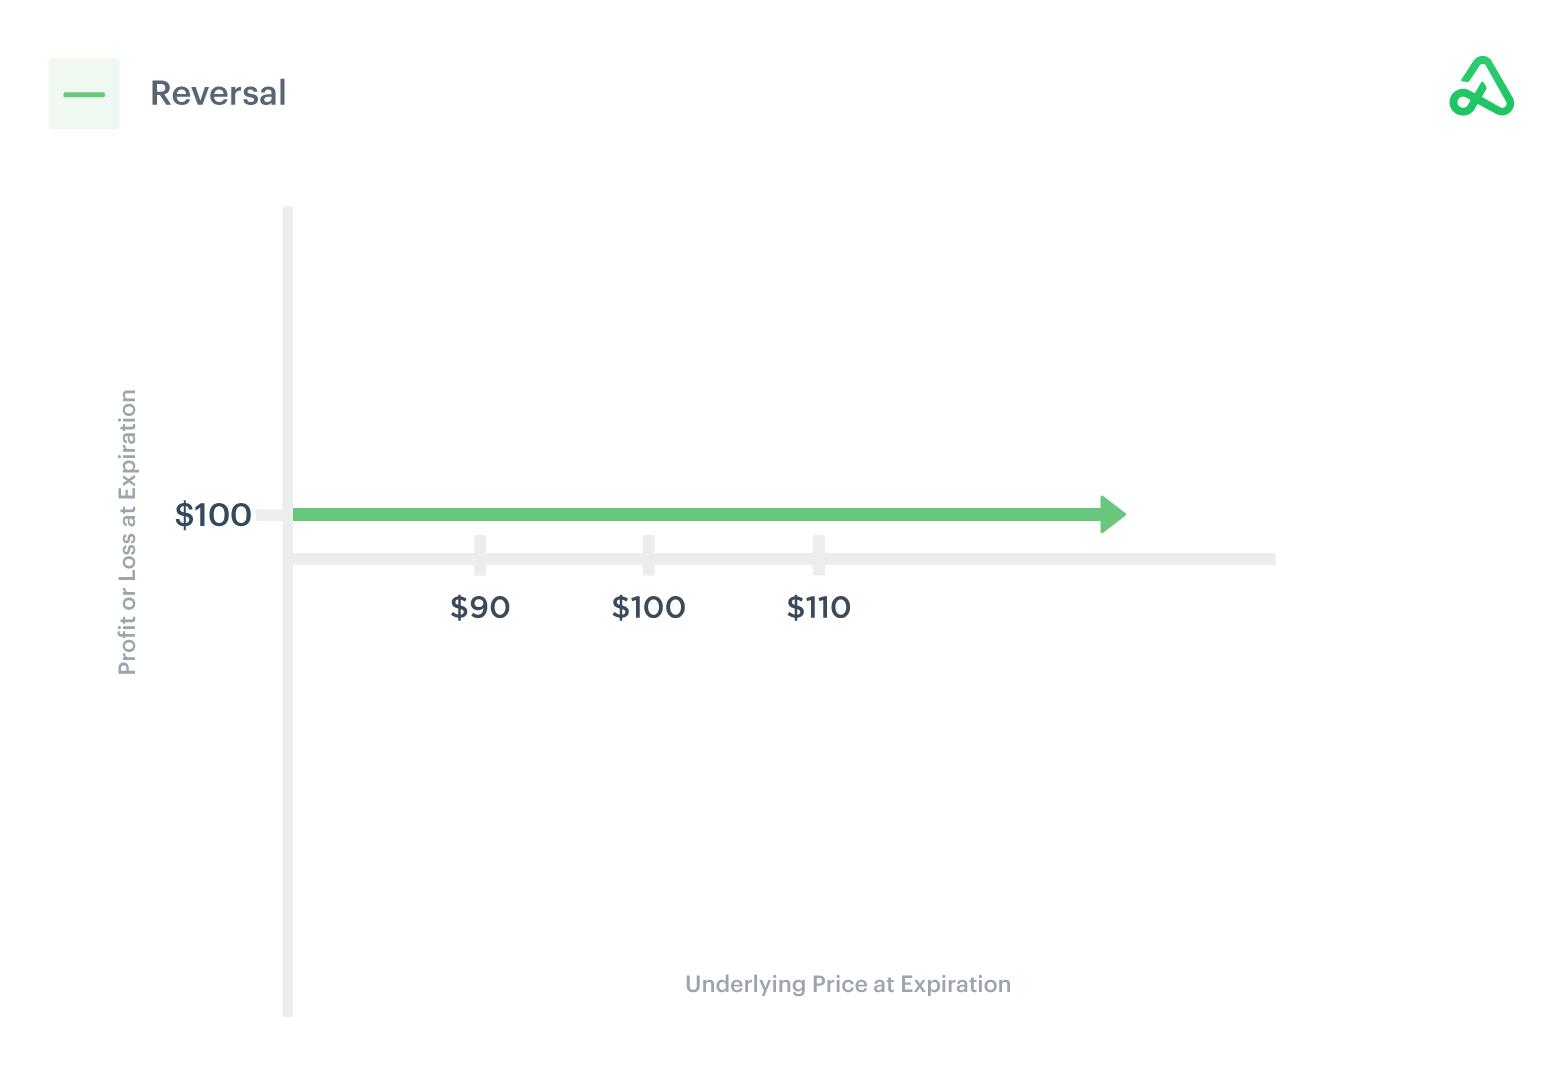 Image of reversal payoff diagram showing guaranteed profit